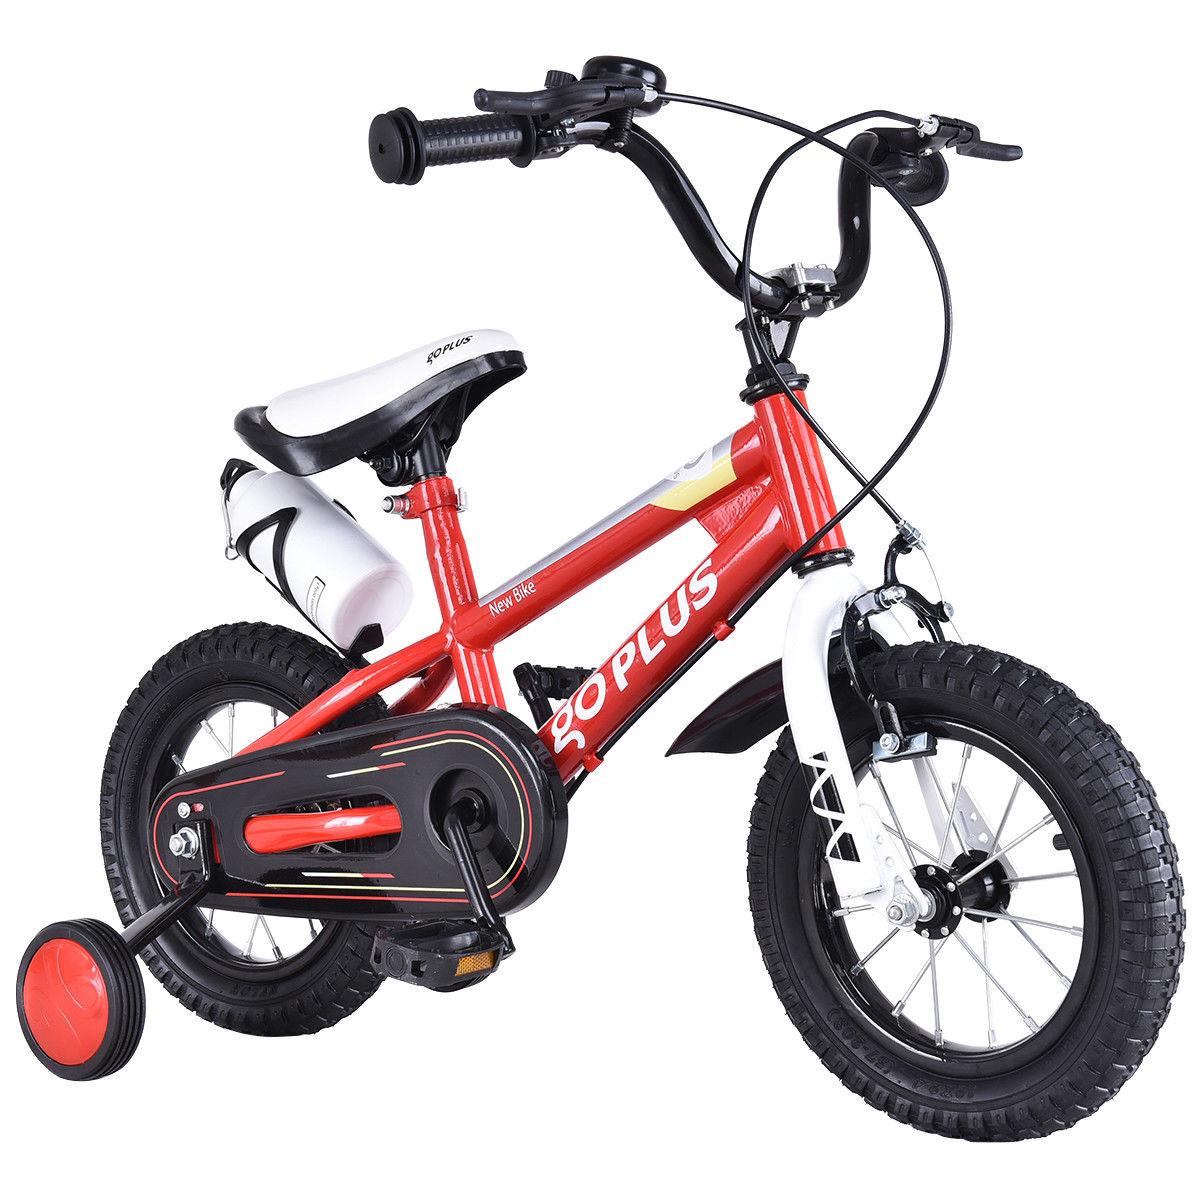 Goplus 16'' Freestyle Kids Bike Bicycle Children Boys & Girls w Training Wheels Red by Costway